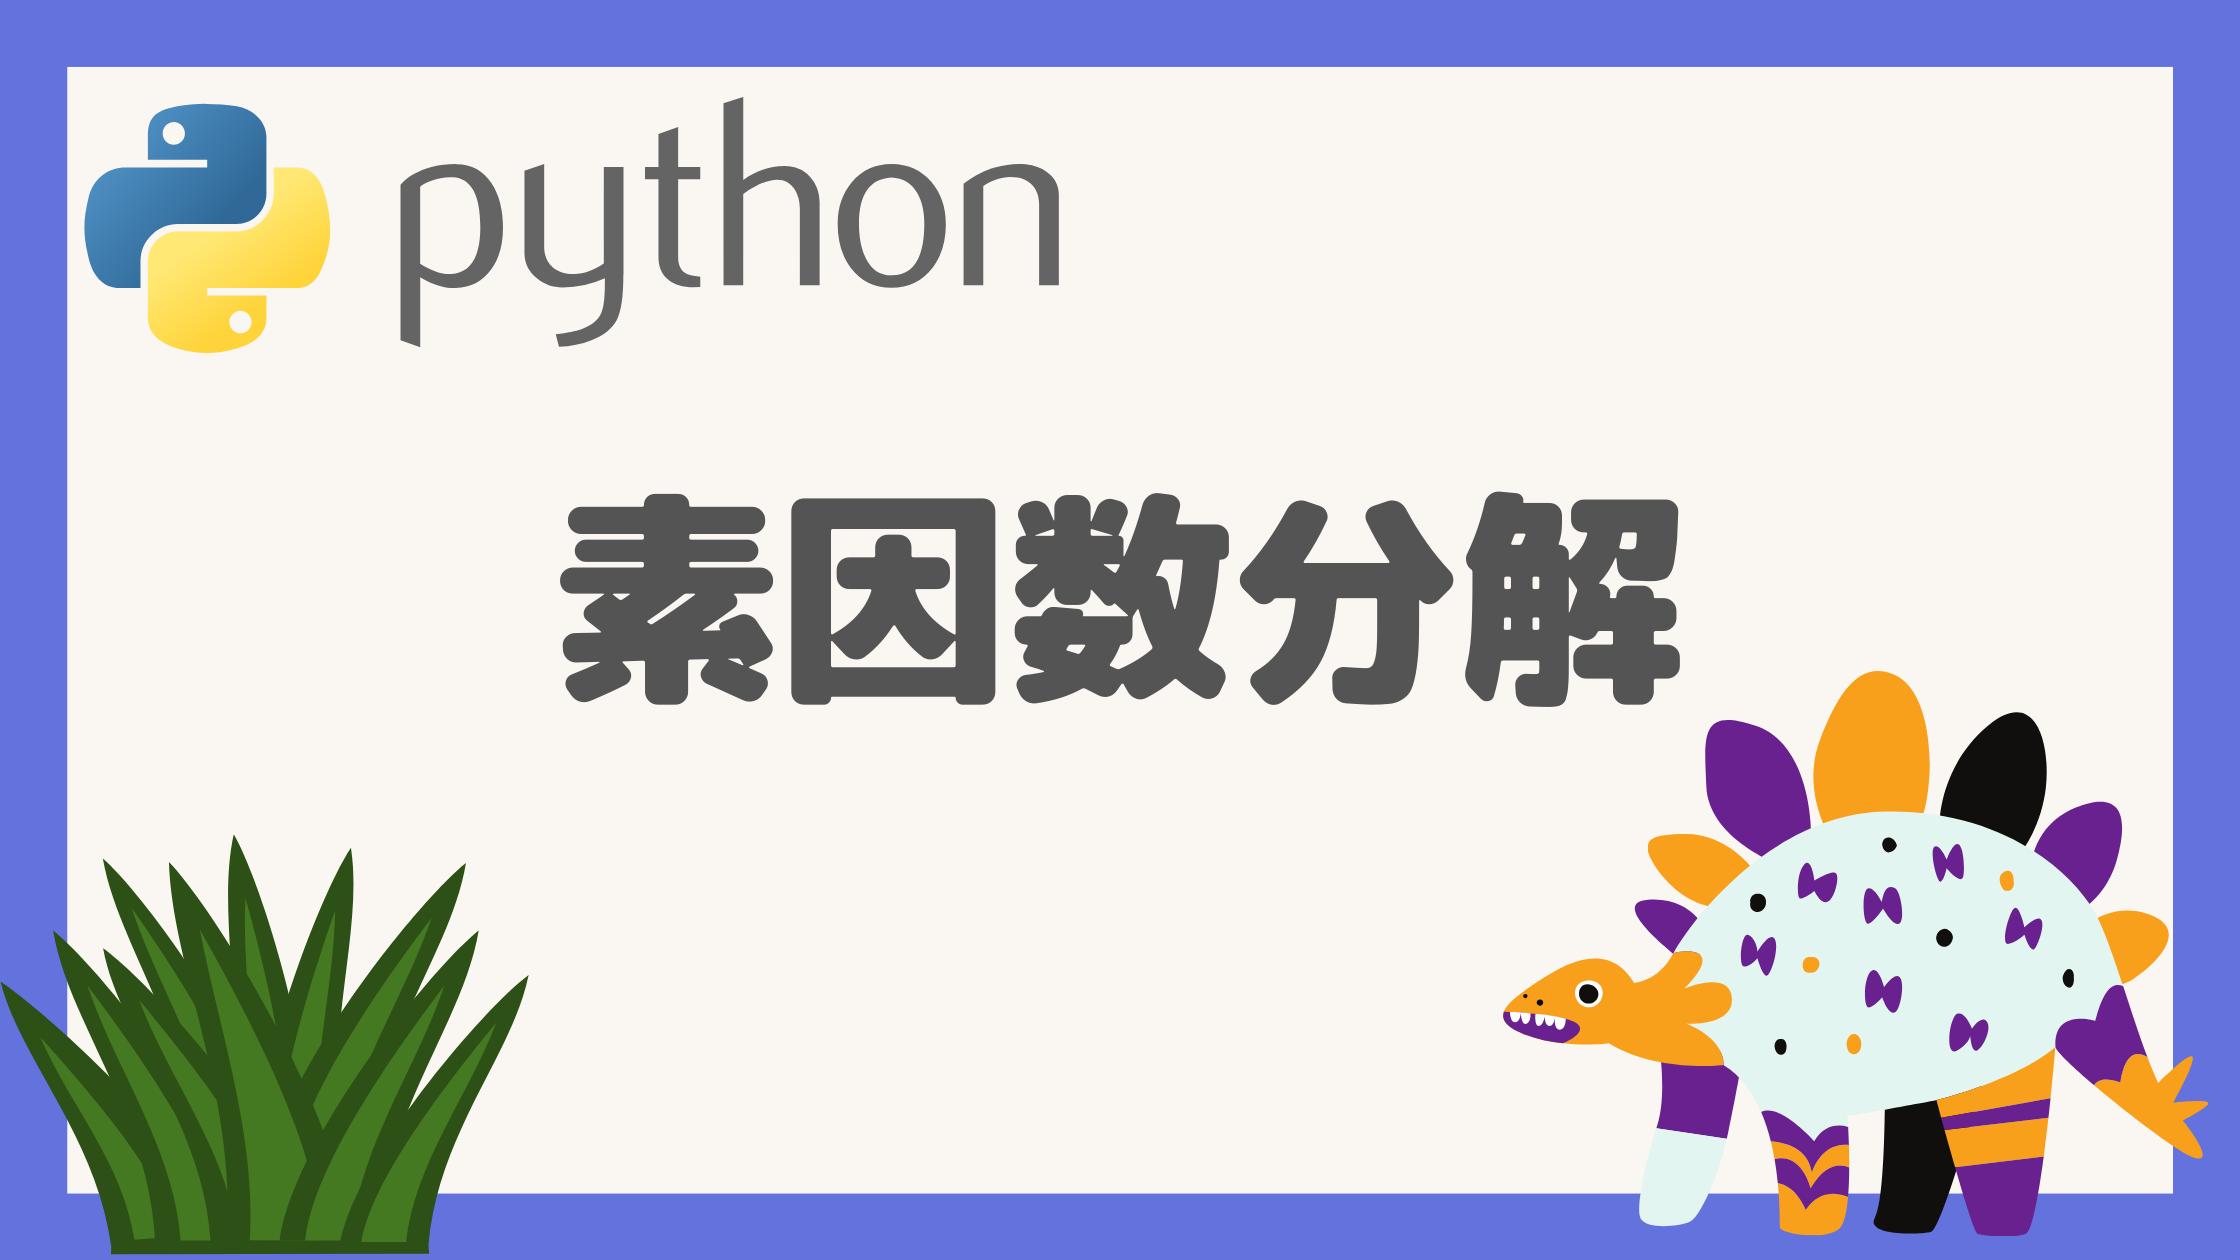 pythonで素因数分解する記事のアイキャッチ